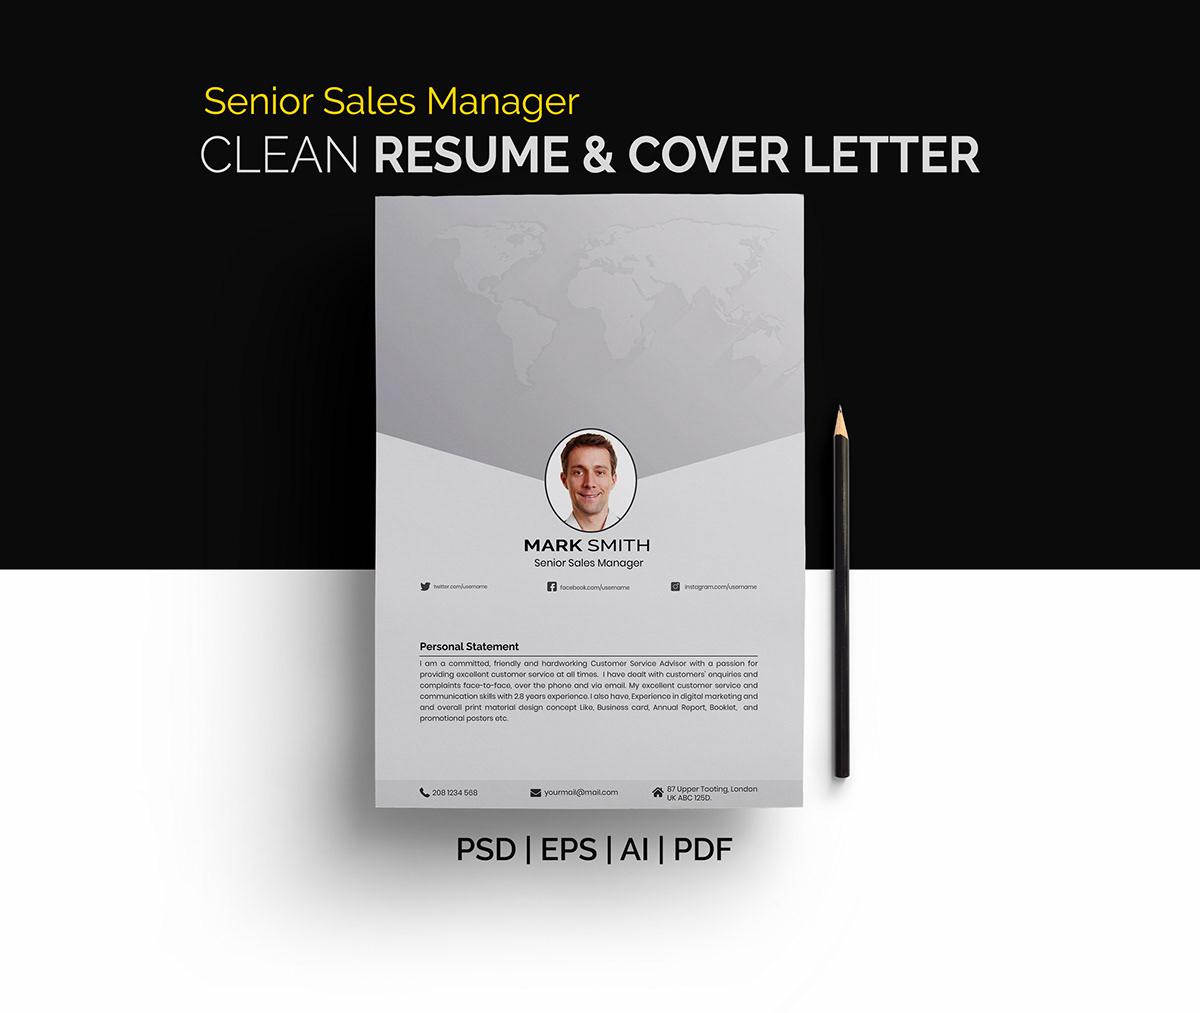 Senior marketing manager resume/ CV on Wacom Gallery